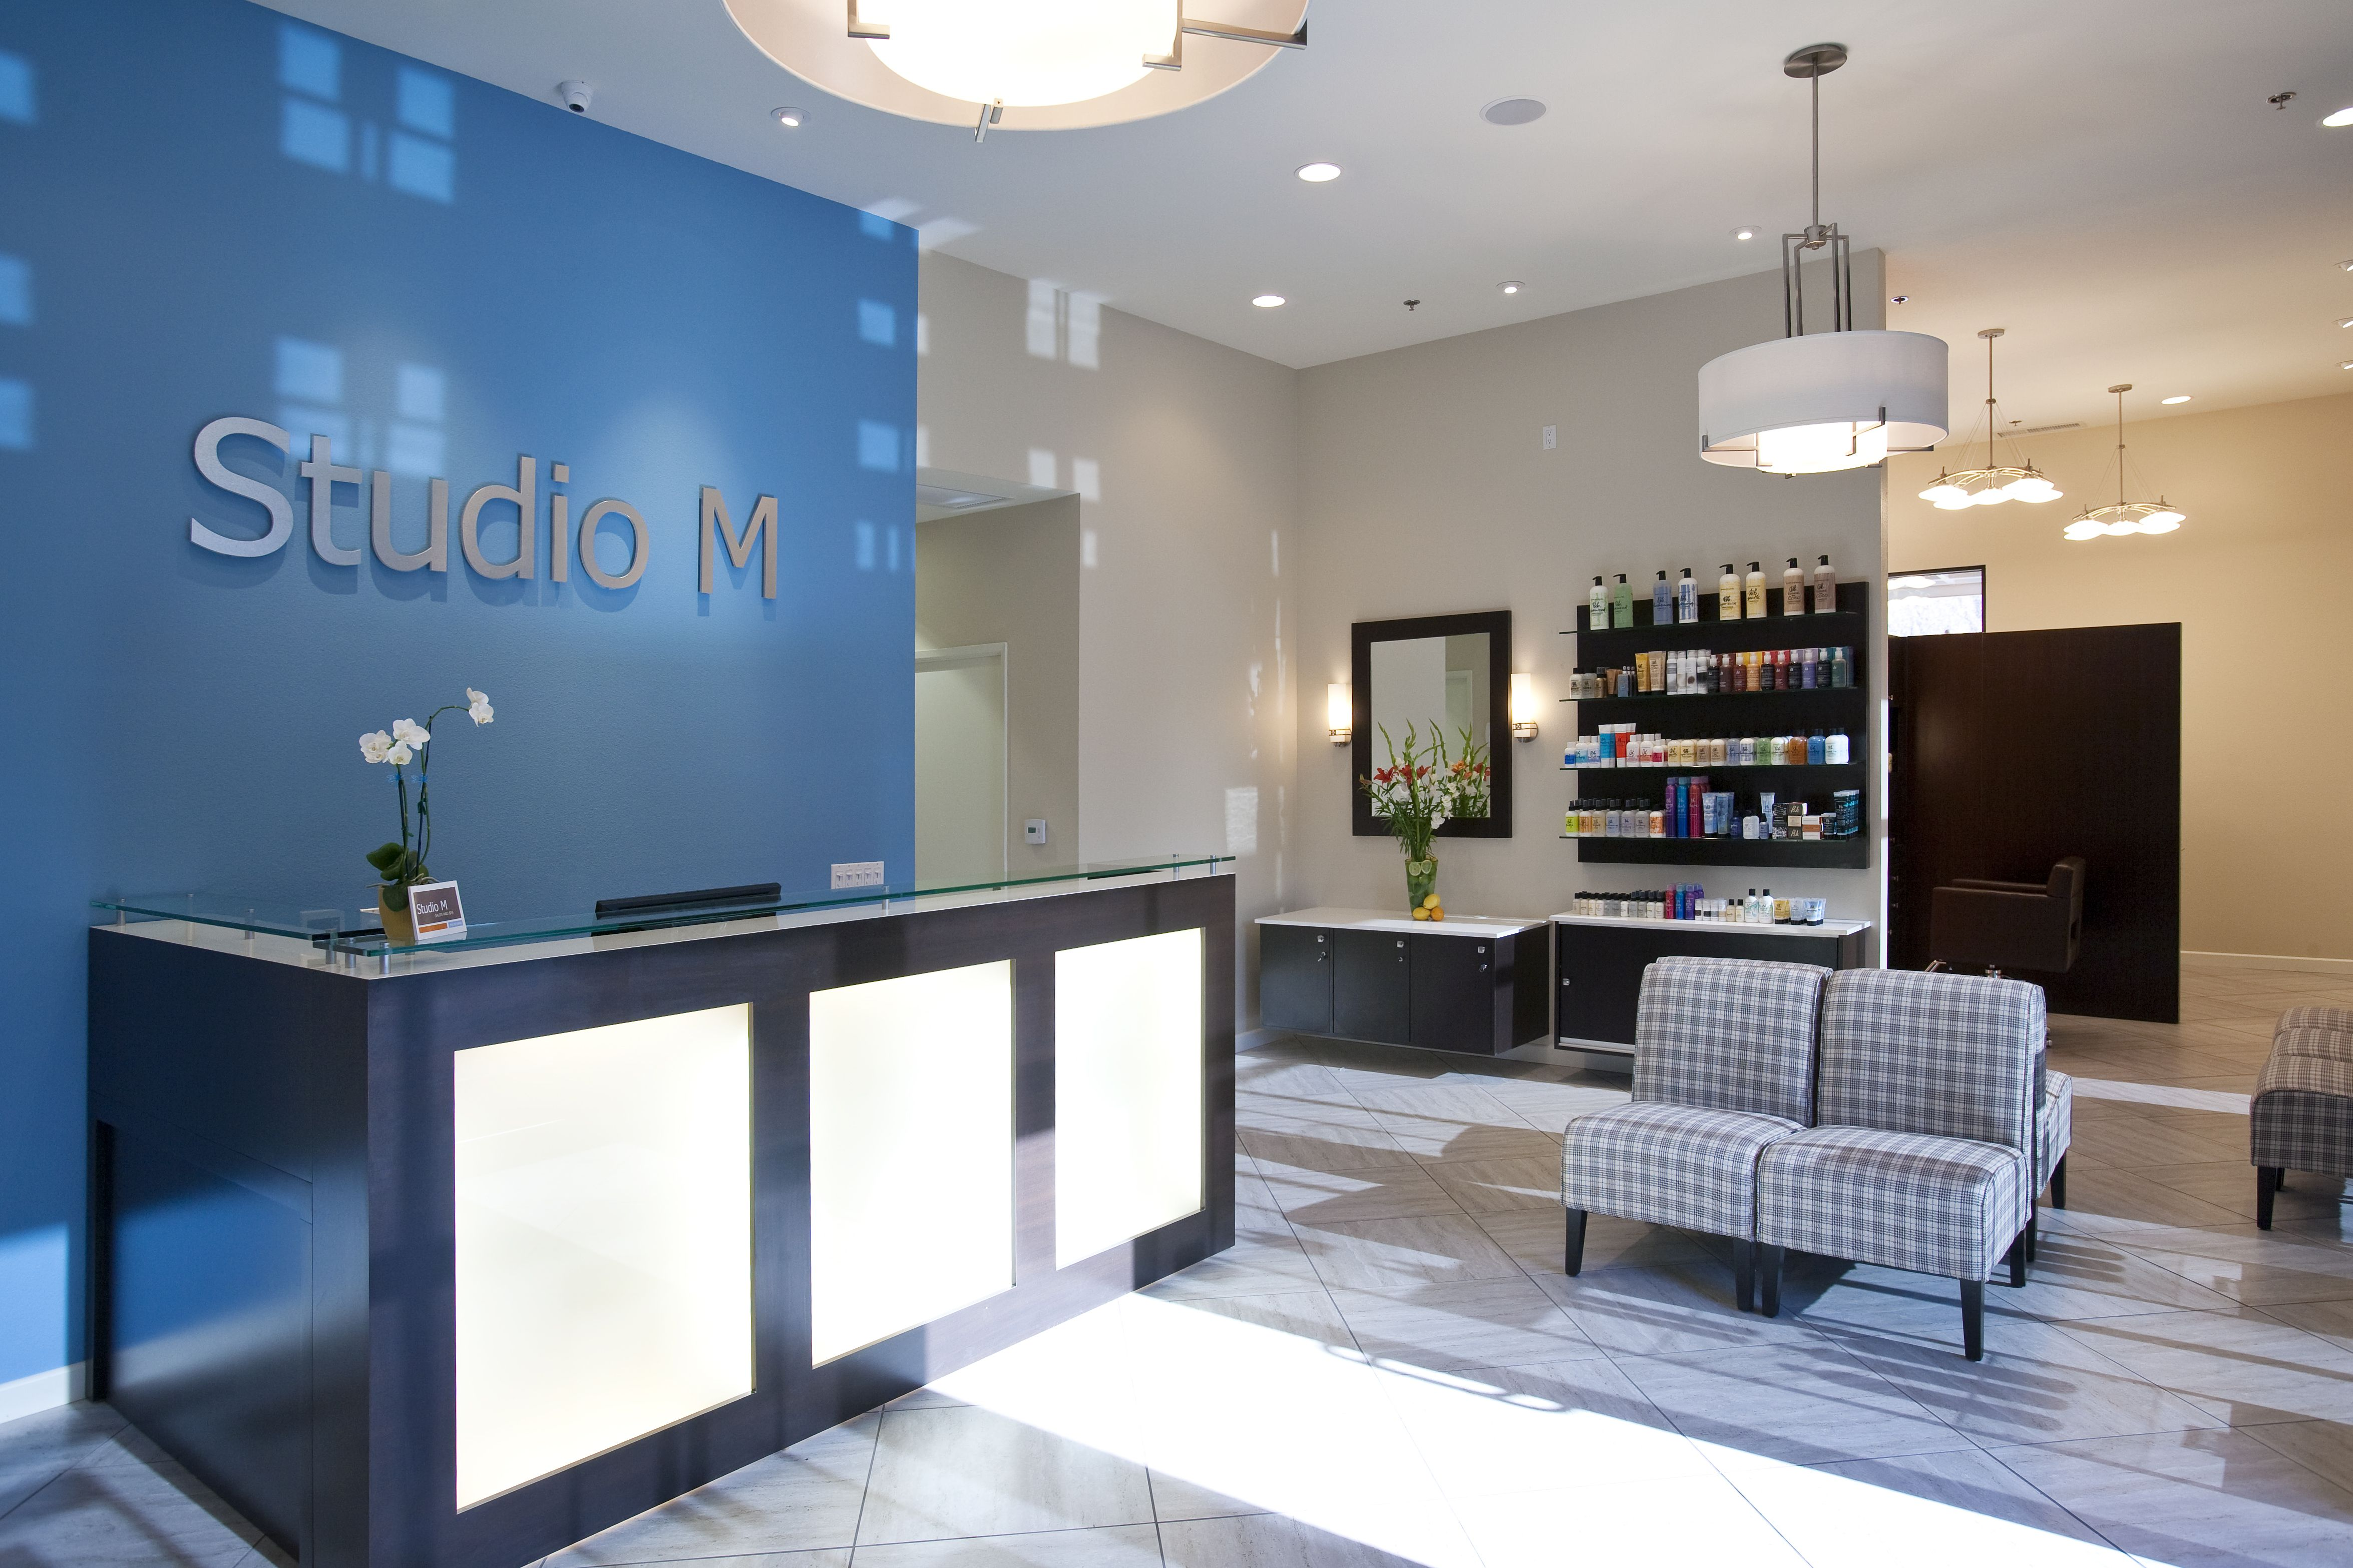 Studio M Salon & Spa, Palm Springs, Ca